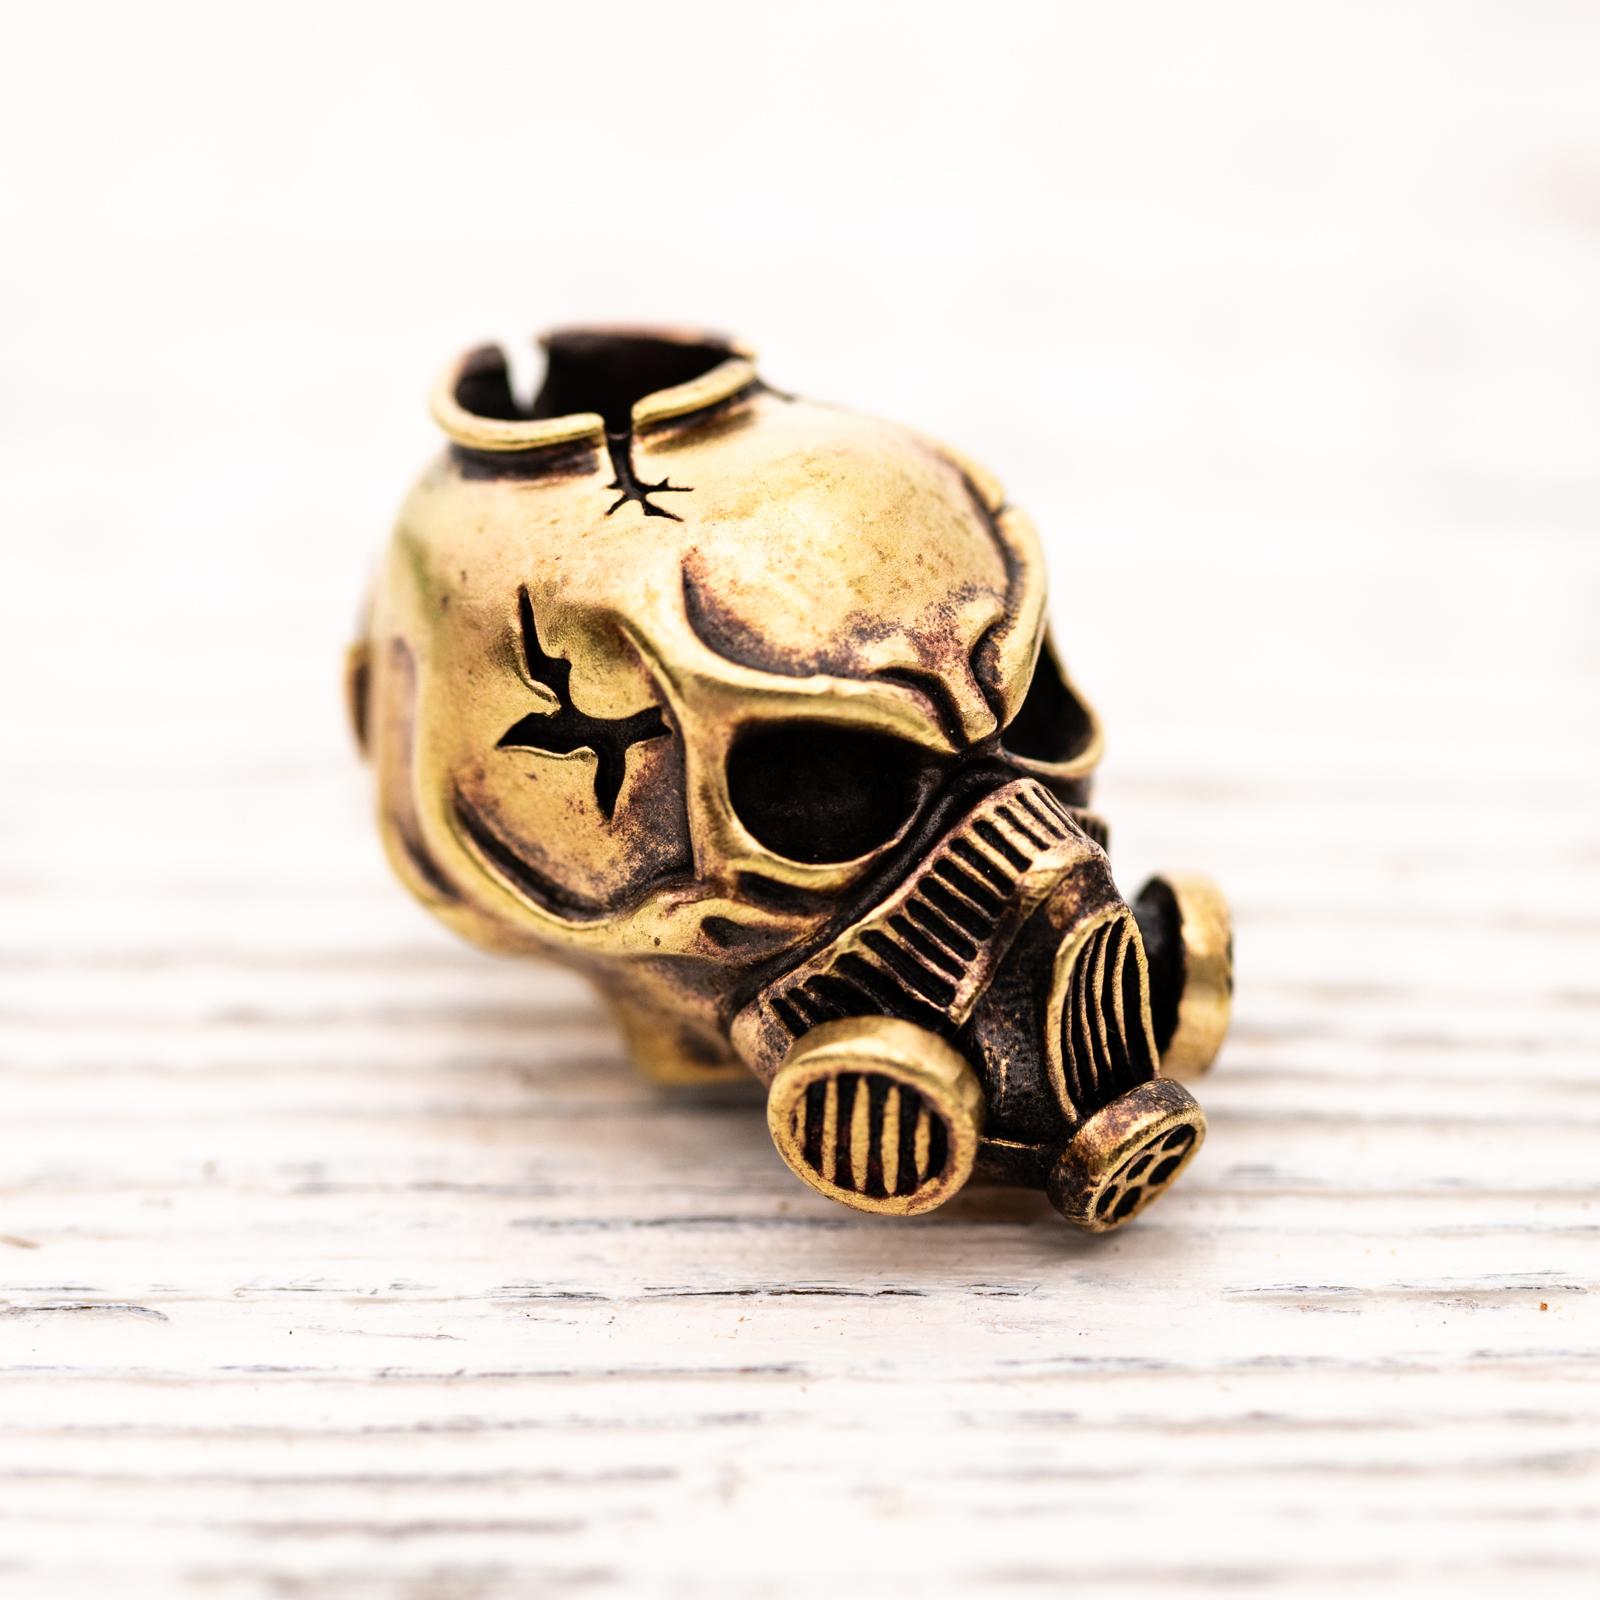 Techno Silver - Brass Bead Post Apocalyptica